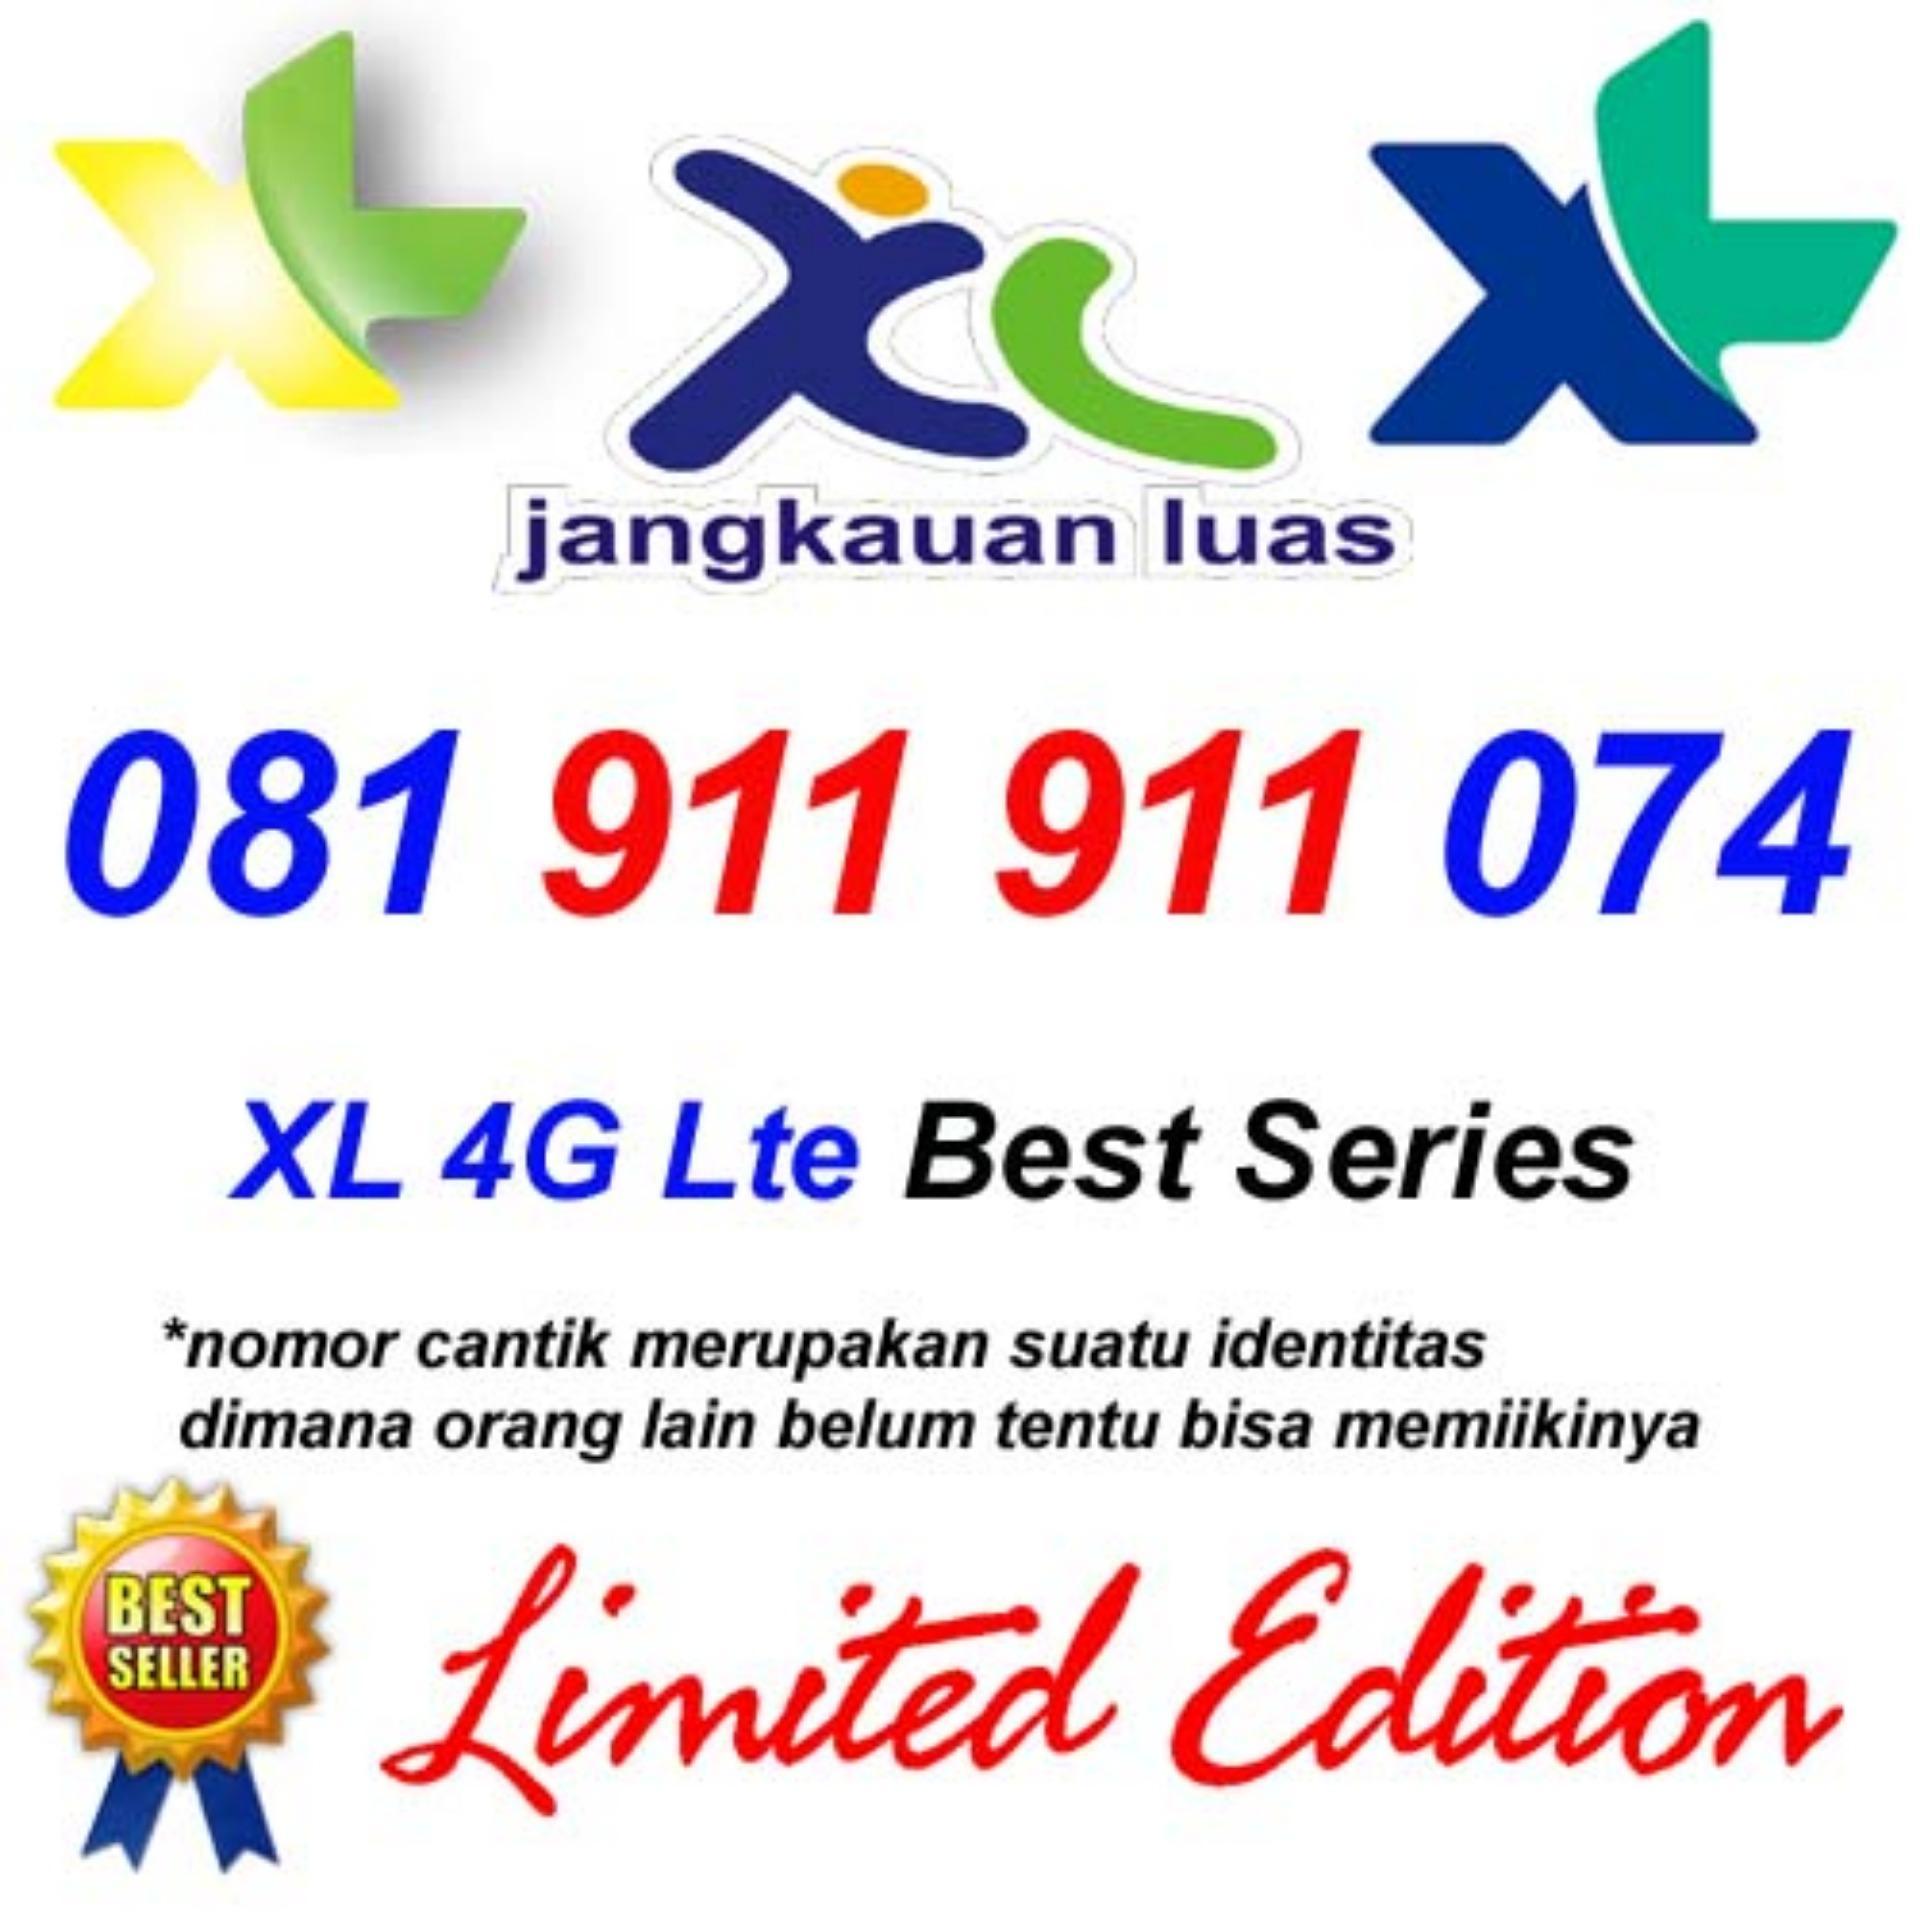 Kartu Sim Perdana Selular Voucer Paket Internet 3 Aon Xl 4g Lte 081 911 074 Nomor Cantik